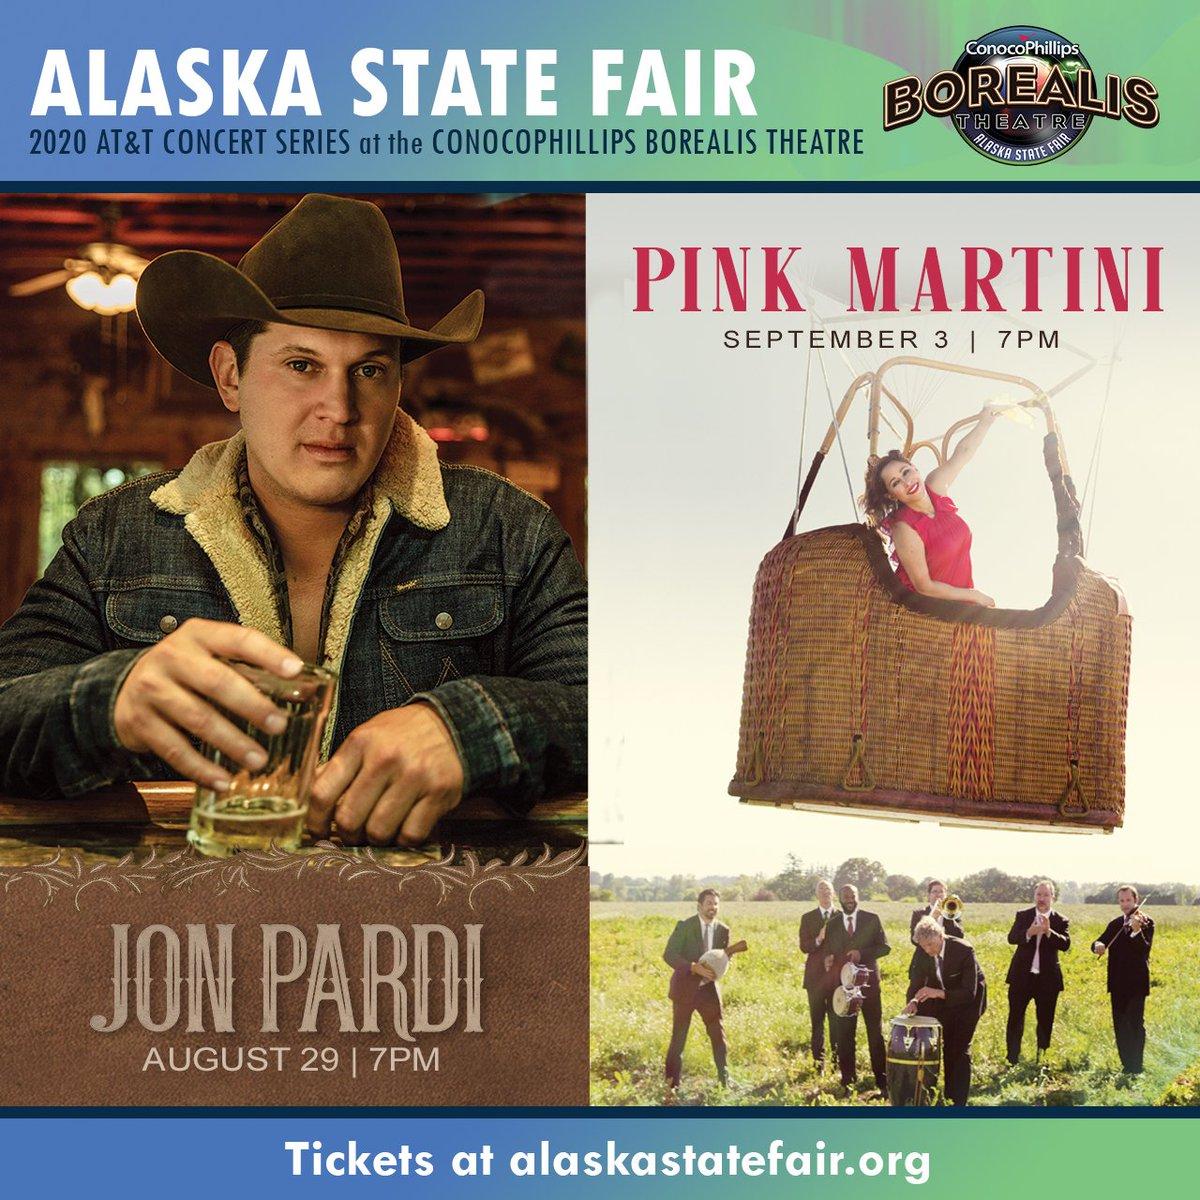 Alaska State Fair 2020 Admissionand Parking.Alaska State Fair Alaskastatefair Twitter Profile And